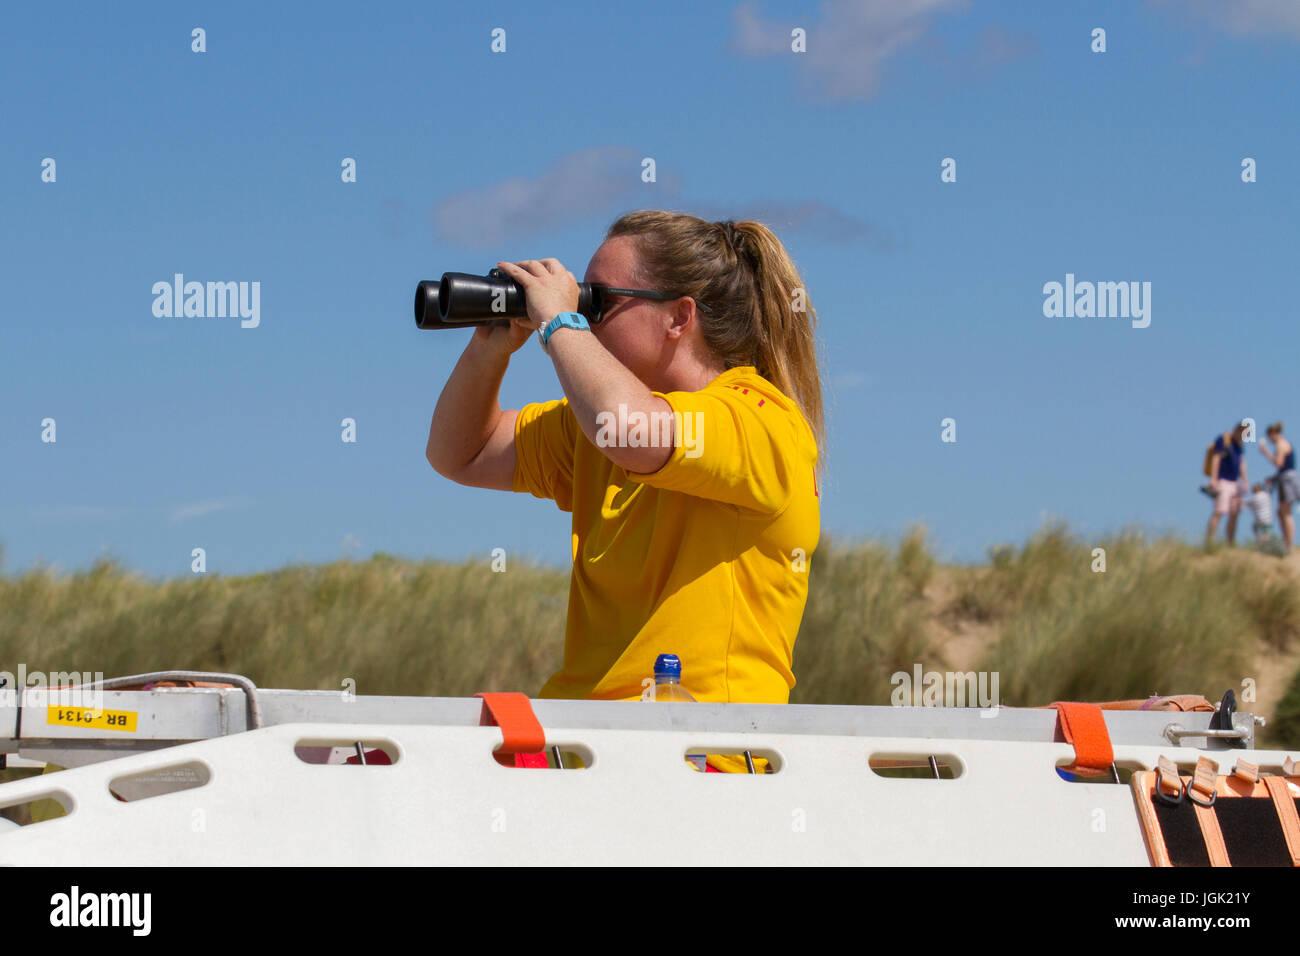 cb140c4e0d3 Female lifeguard on Crosby Beach